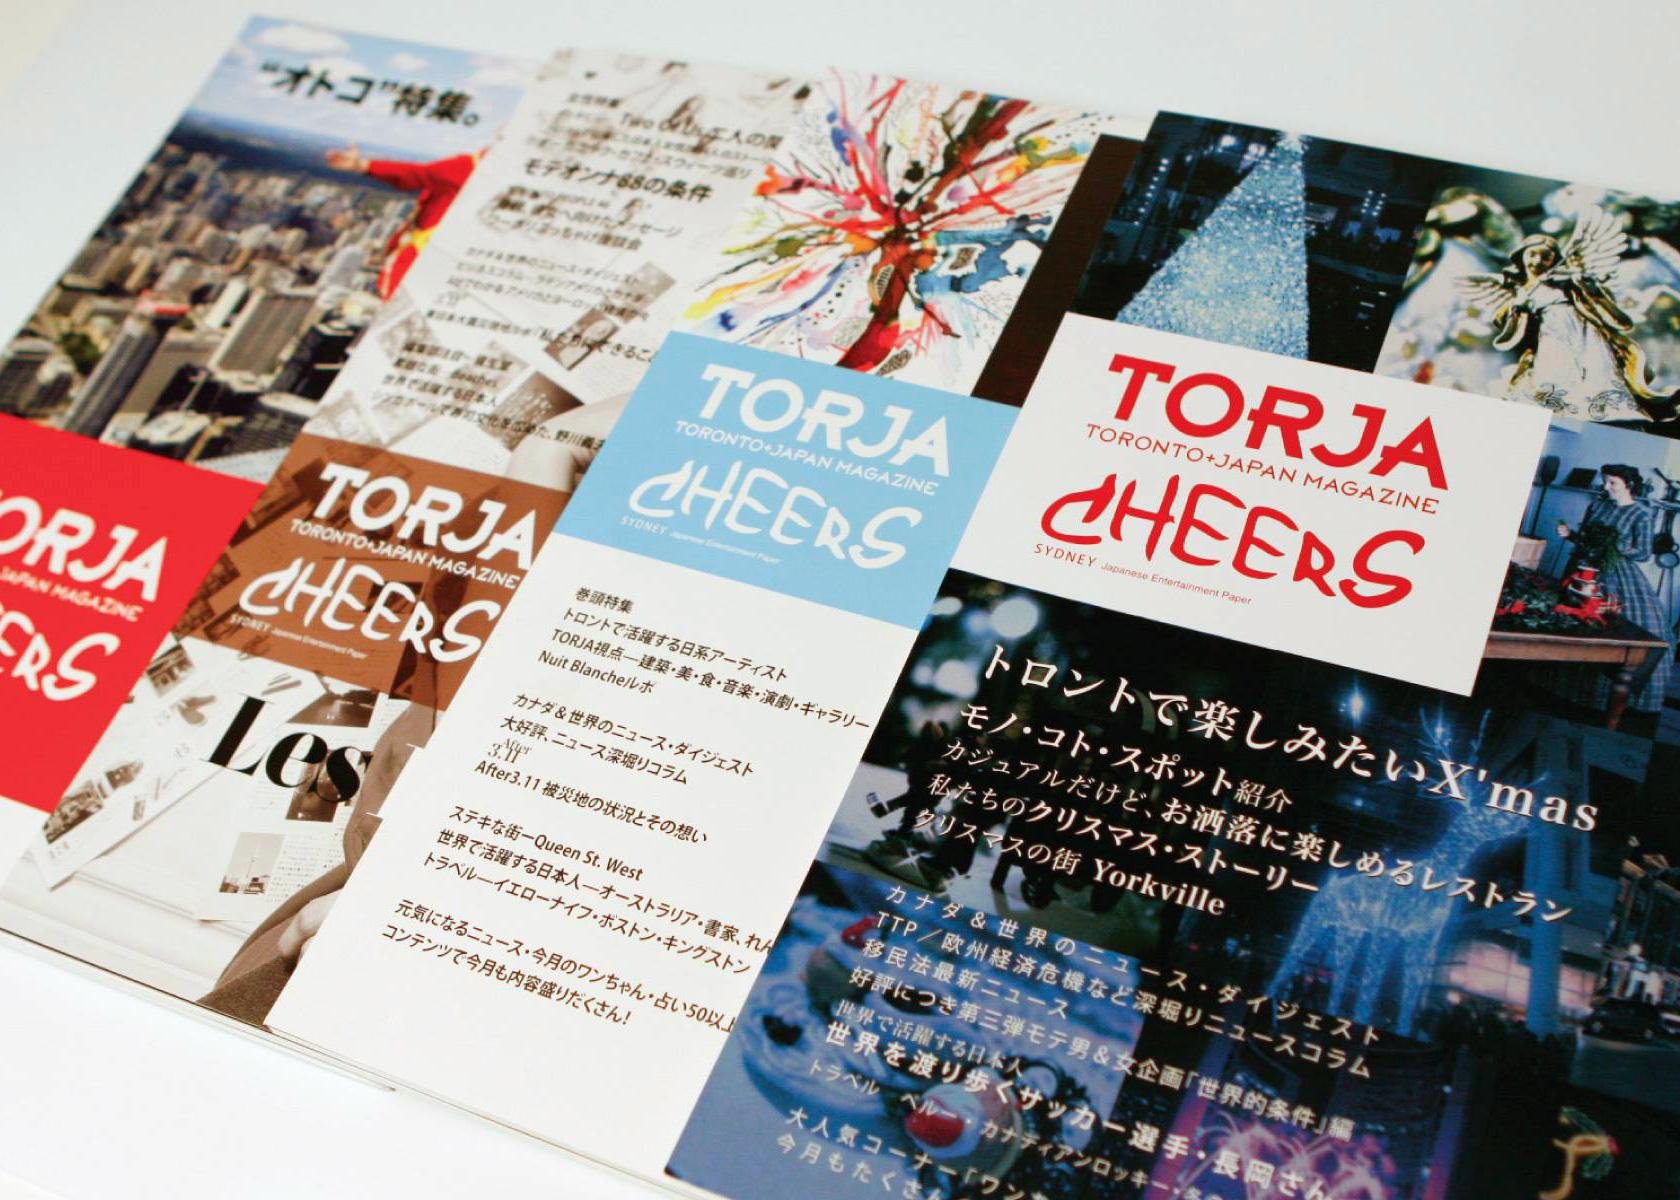 Torja-Magazine